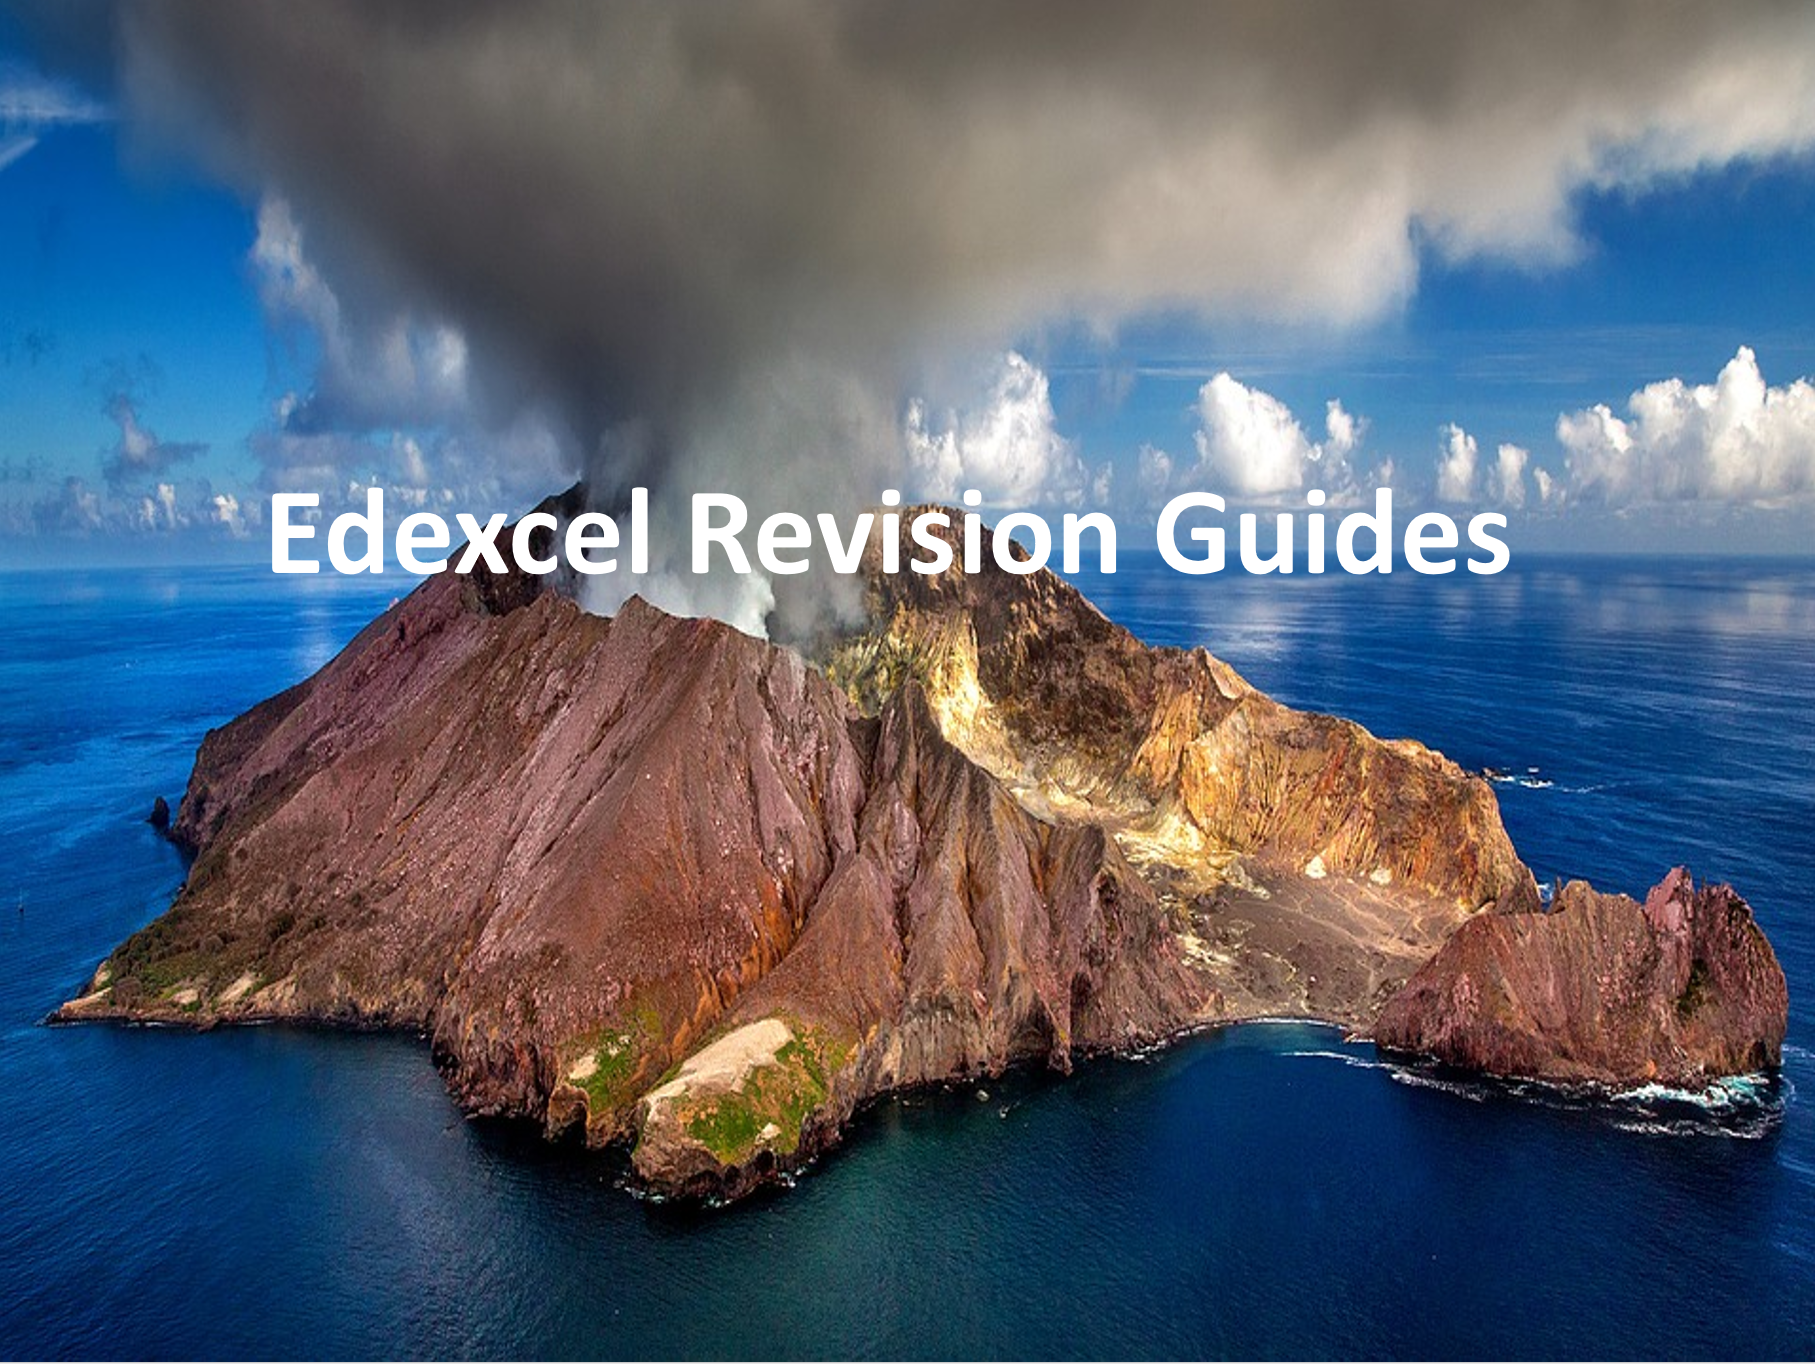 Edexcel Revision Guides